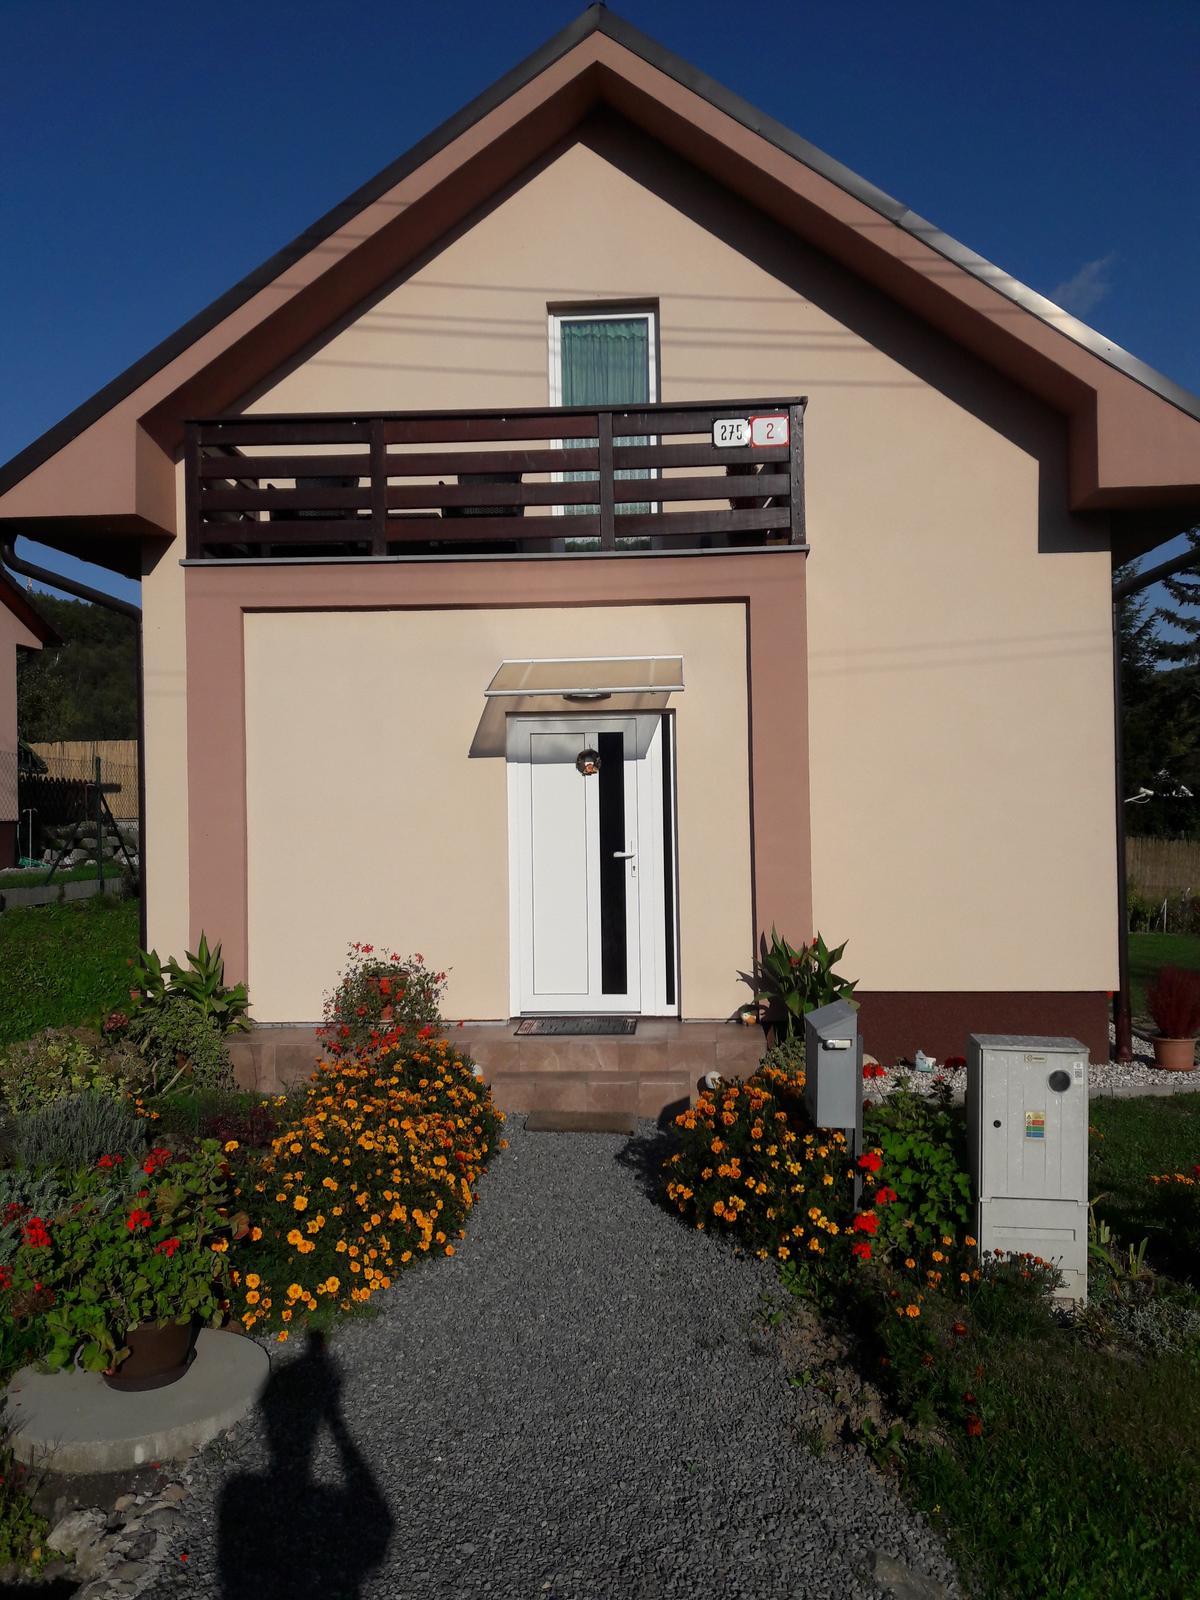 Náš malý domček - Obrázok č. 2